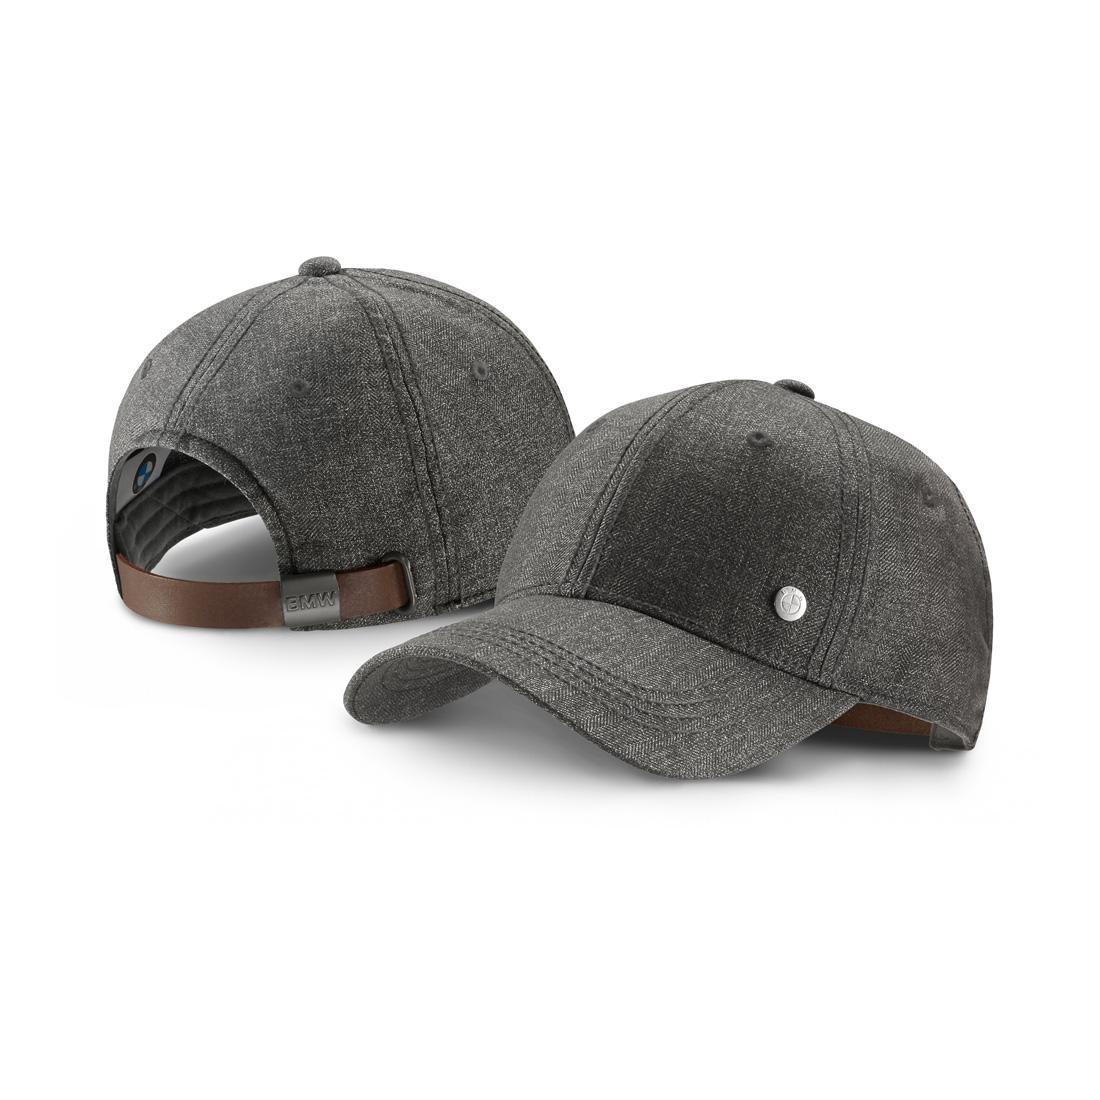 c80ca4ba227 Buy BMW Genuine Logo Grey Gray Hat Cap in Cheap Price on Alibaba.com